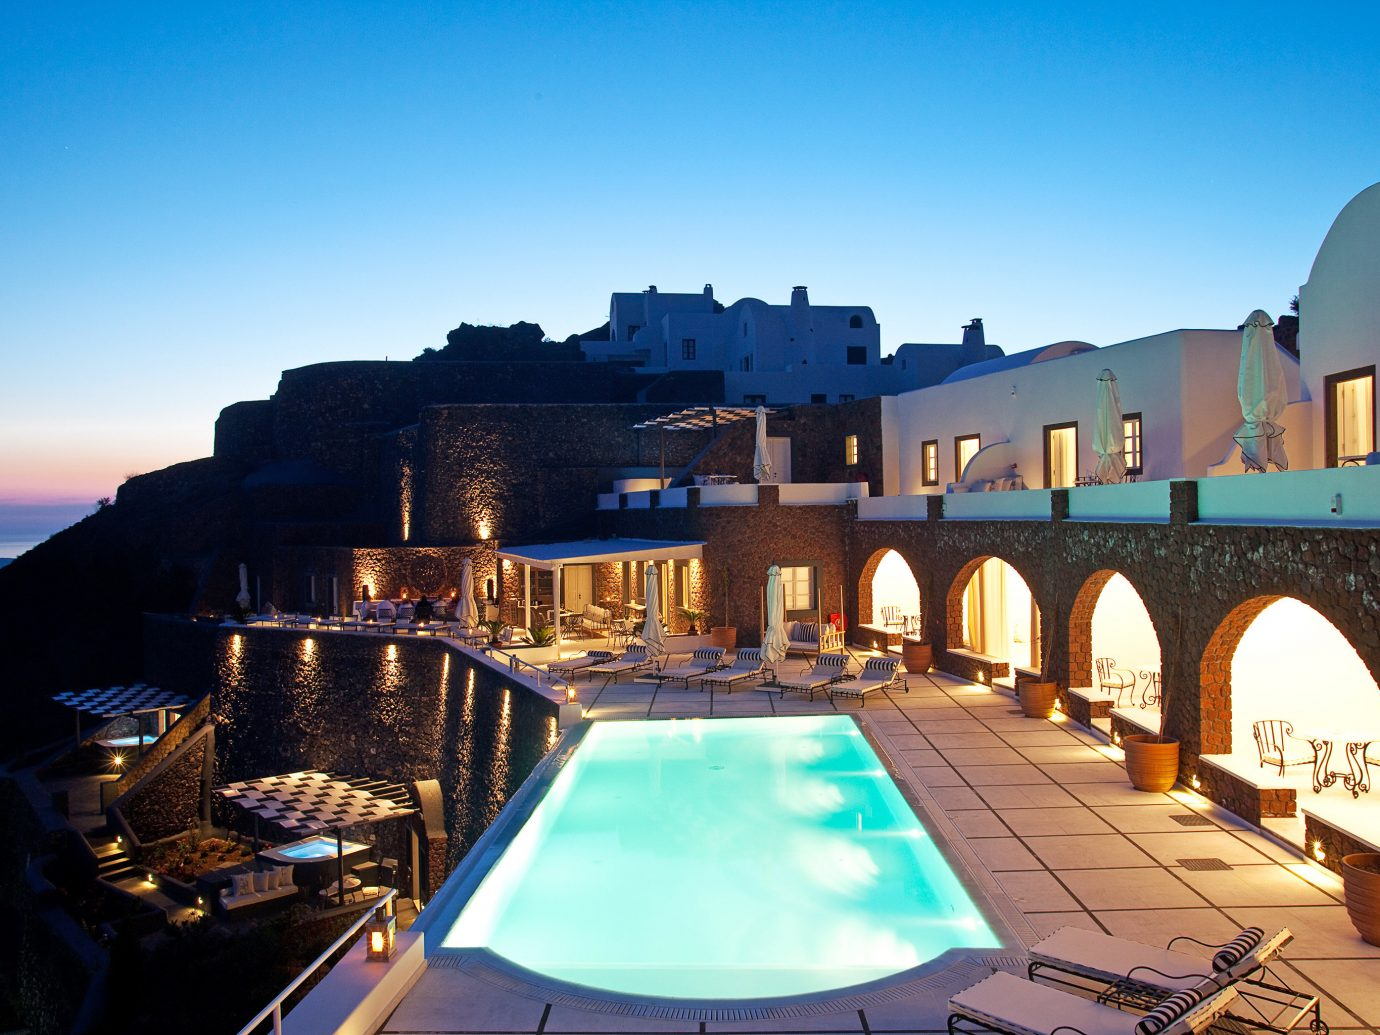 Beach Beachfront Greece Hotels Lounge Luxury Modern Ocean Pool Santorini sky outdoor vacation evening estate dusk Sea swimming pool cityscape Resort